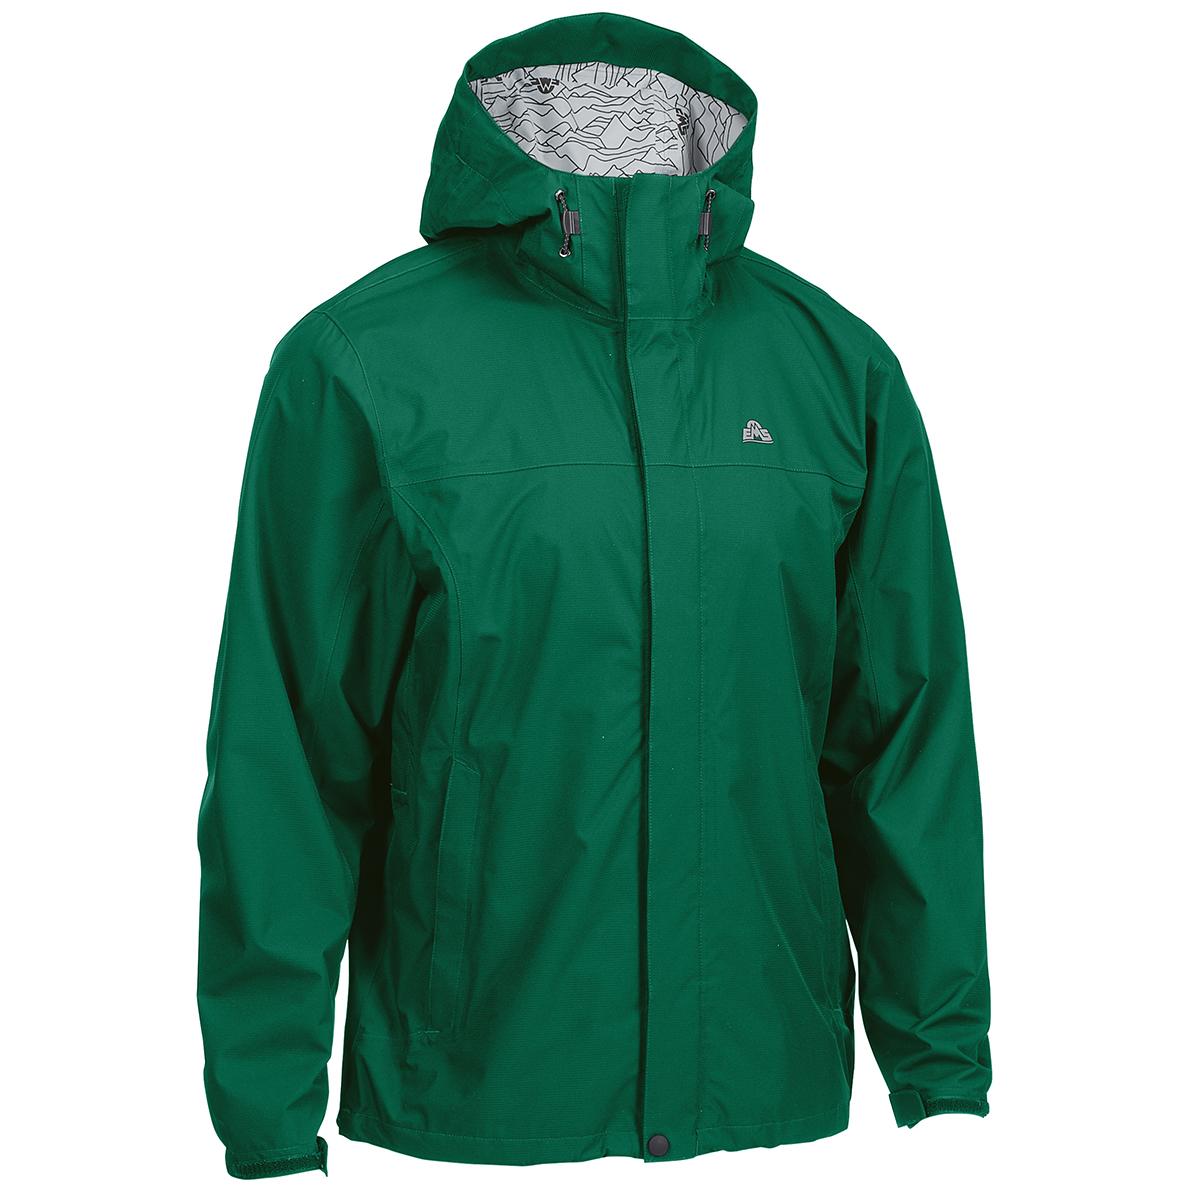 Ems Men's Thunderhead Peak Rain Jacket - Green, M